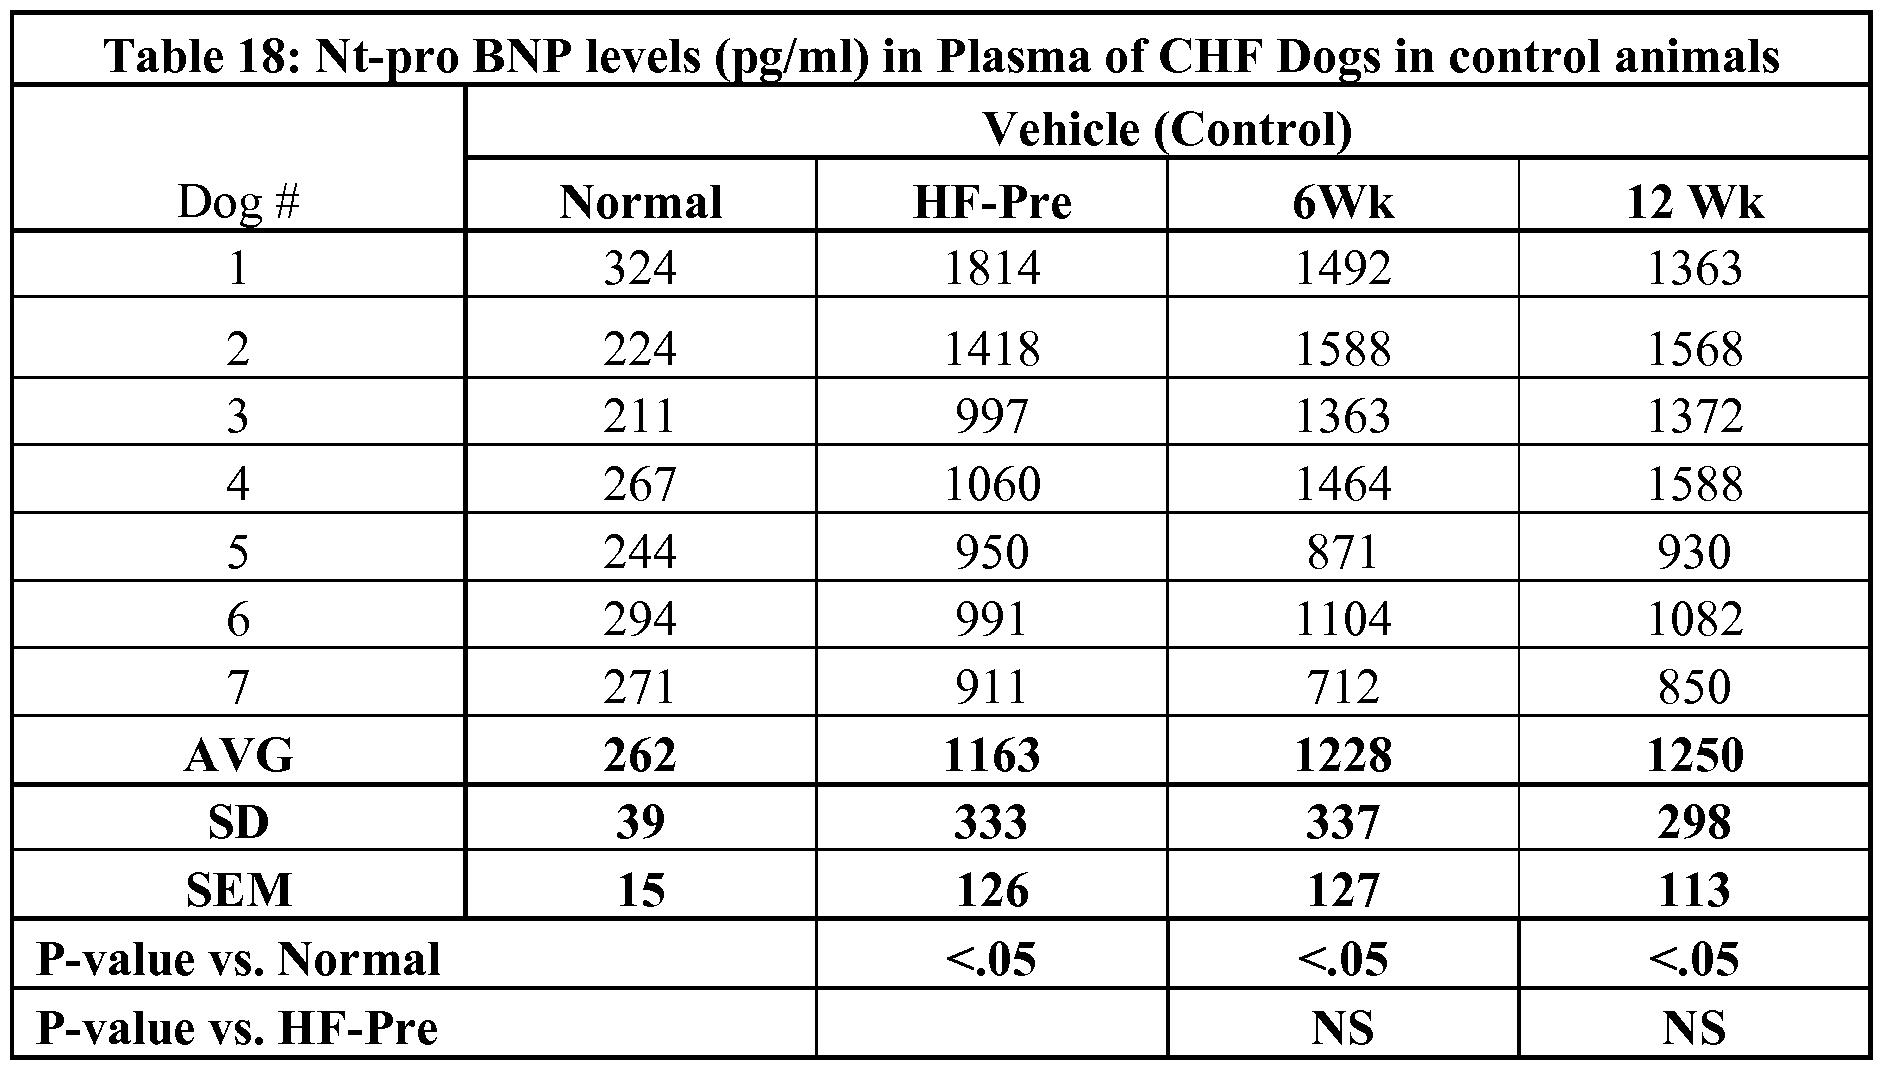 bnp lab test images